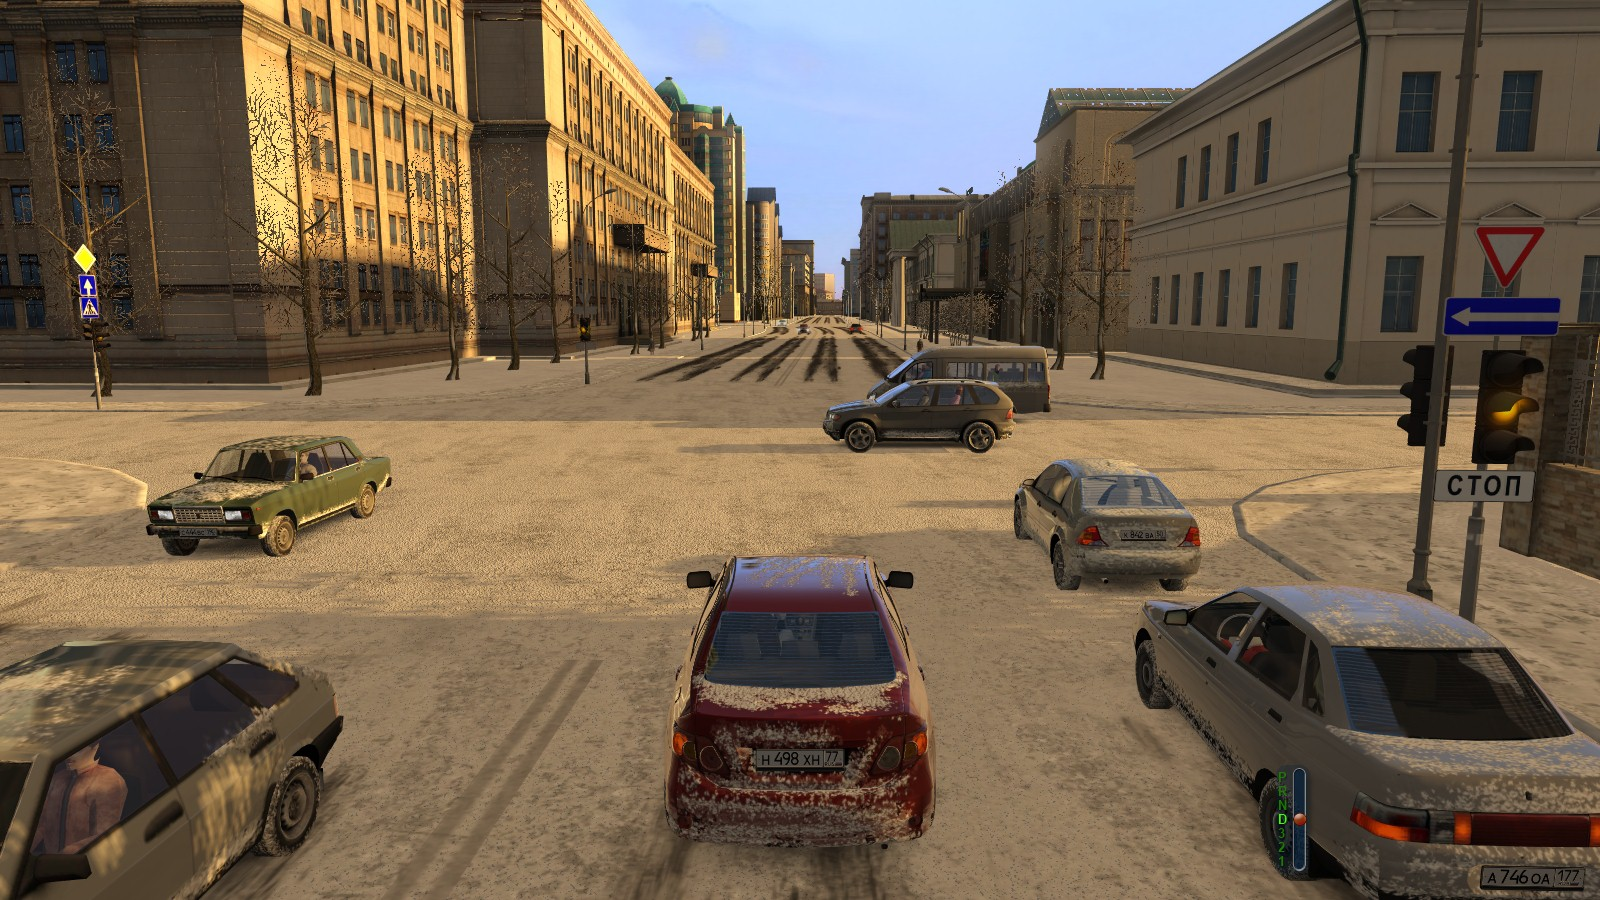 Fillable online city car driving simulator torent tpb solufibras.